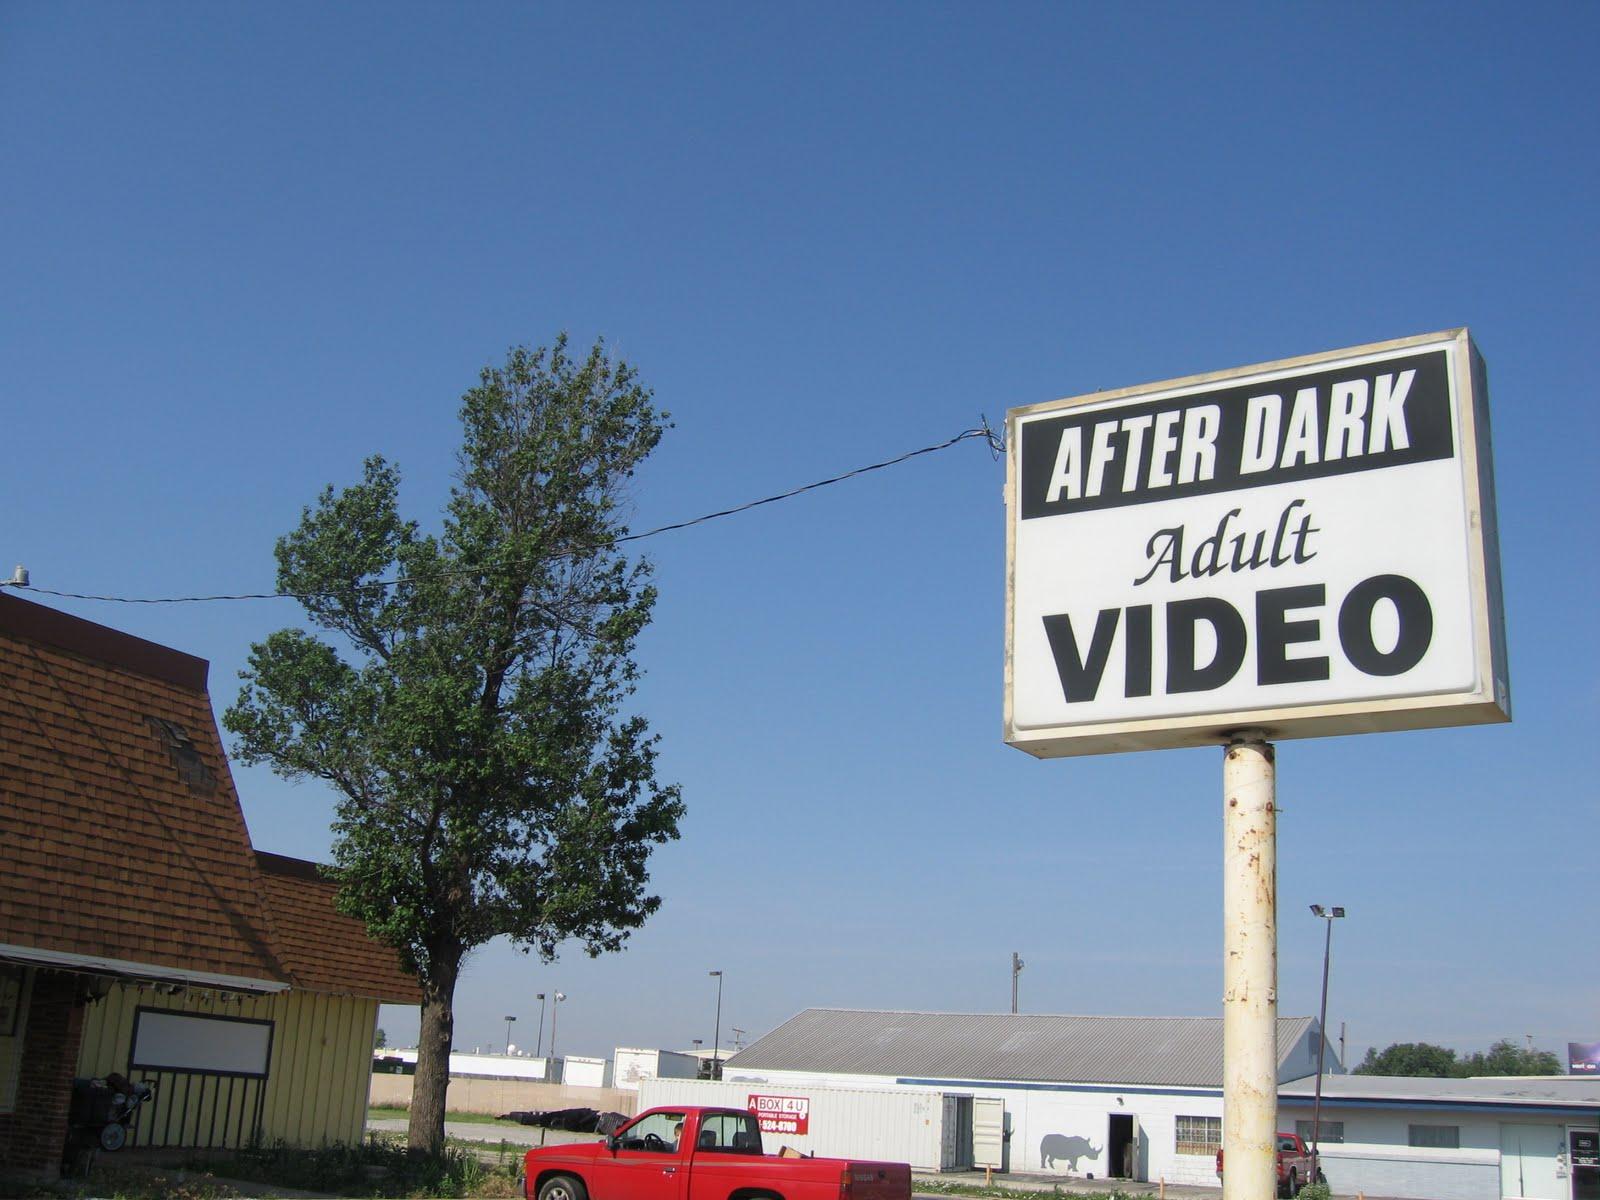 Porn stores in wichita ks